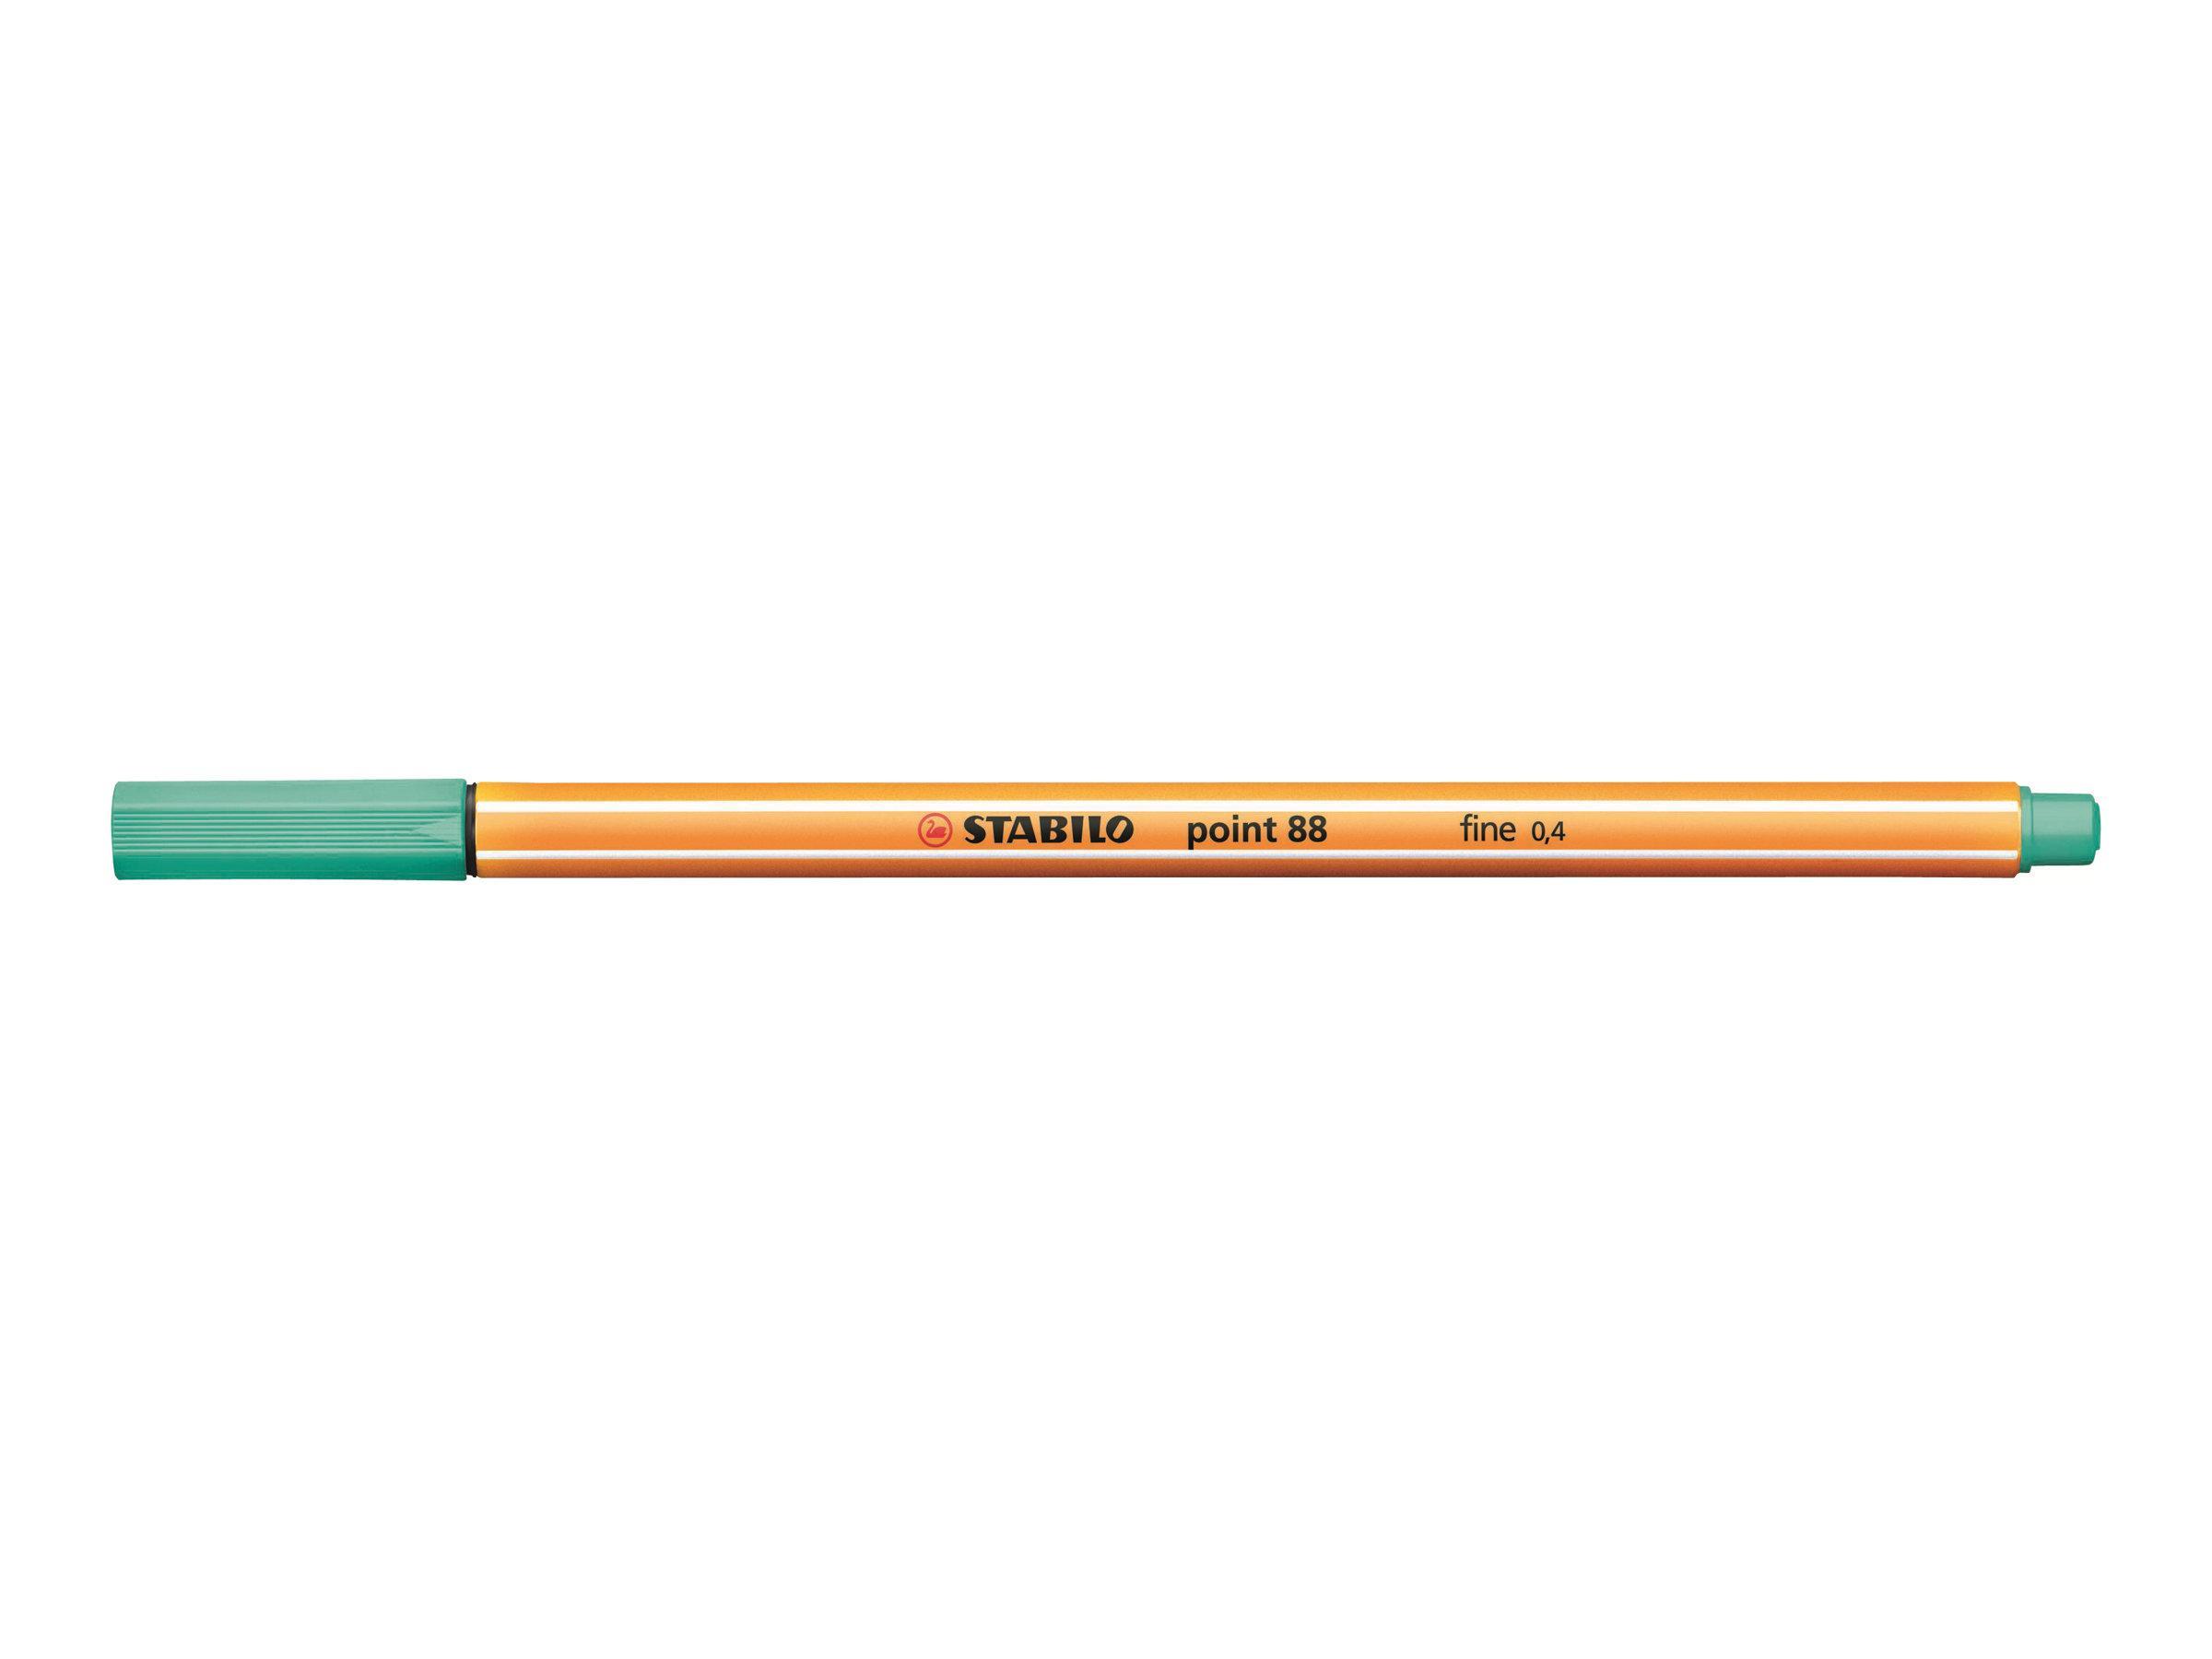 STABILO point 88 - Feutre fin - 0.4 mm - vert glacé